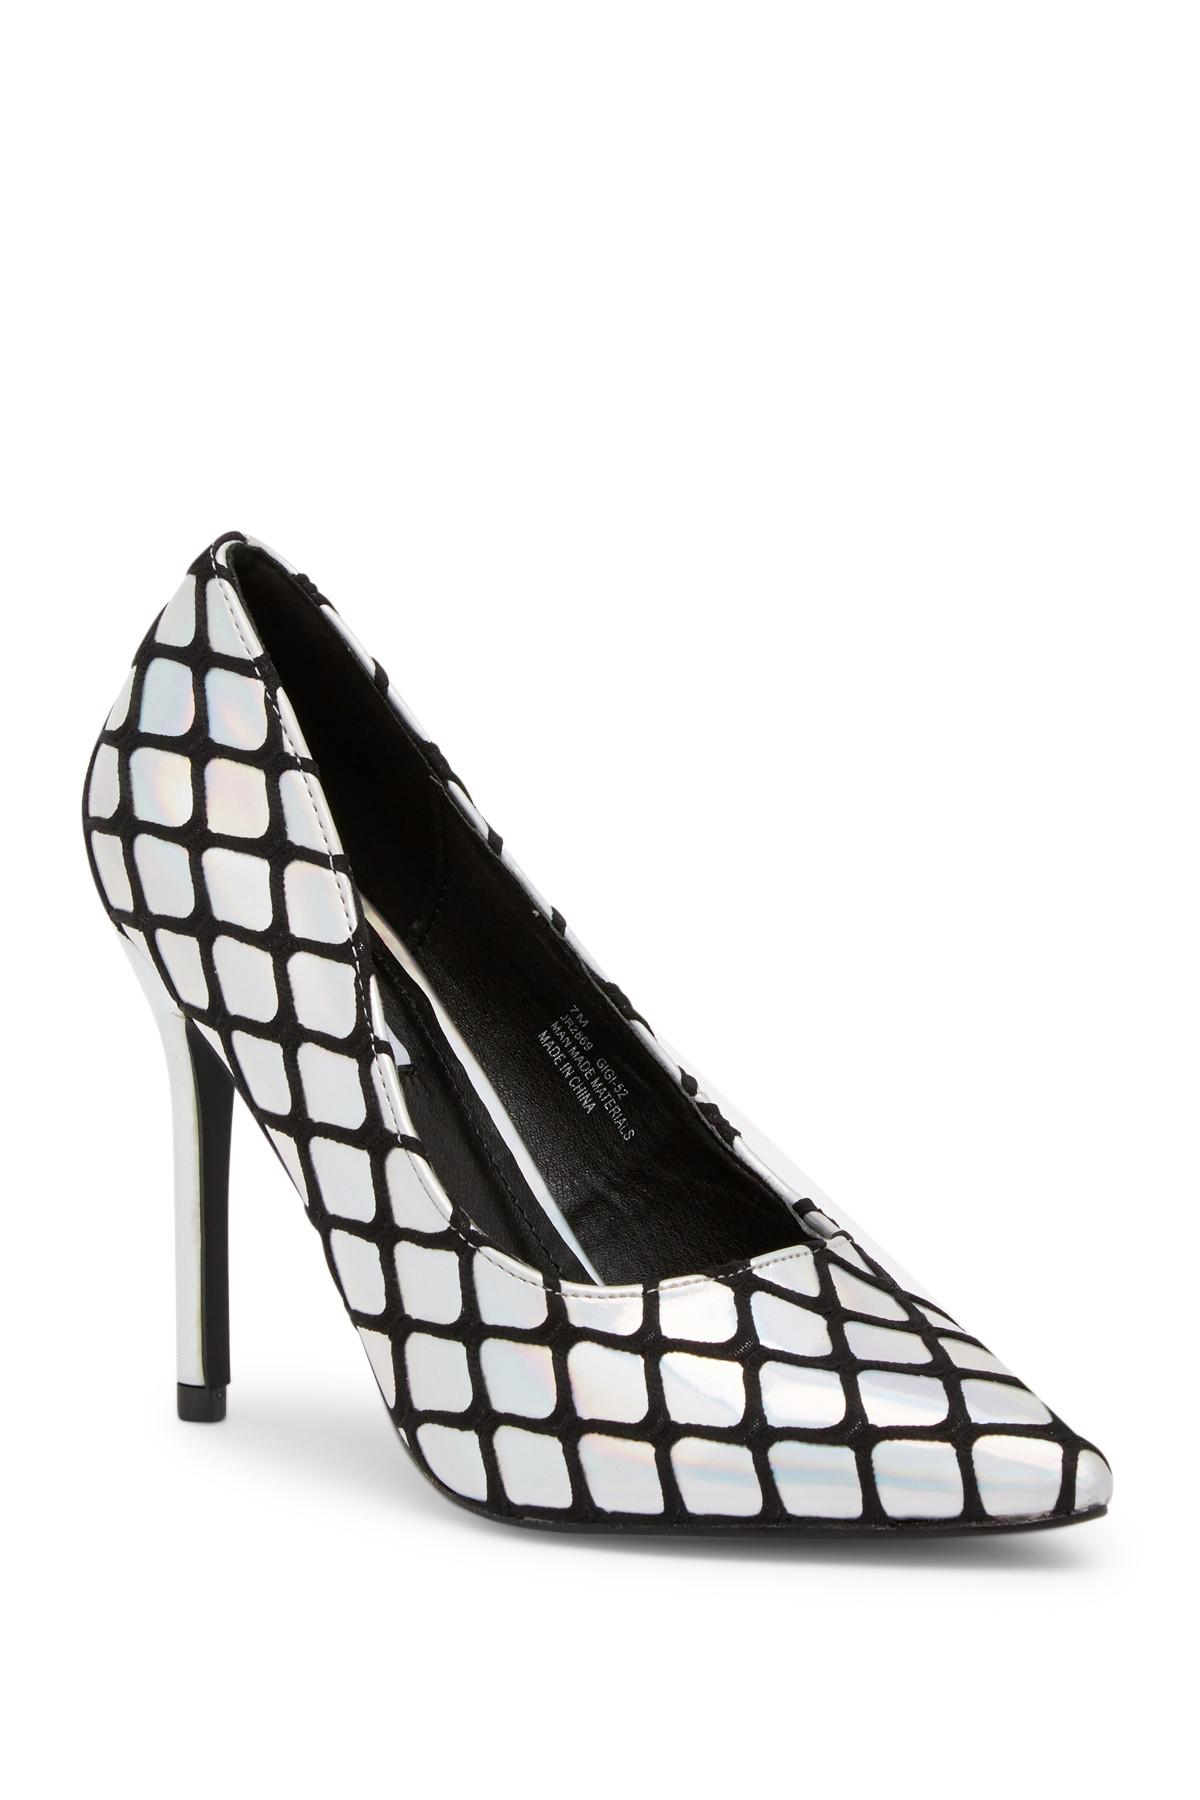 e39d4050d0a Cape Robbin Black Gigi Fishnet Stiletto Heel